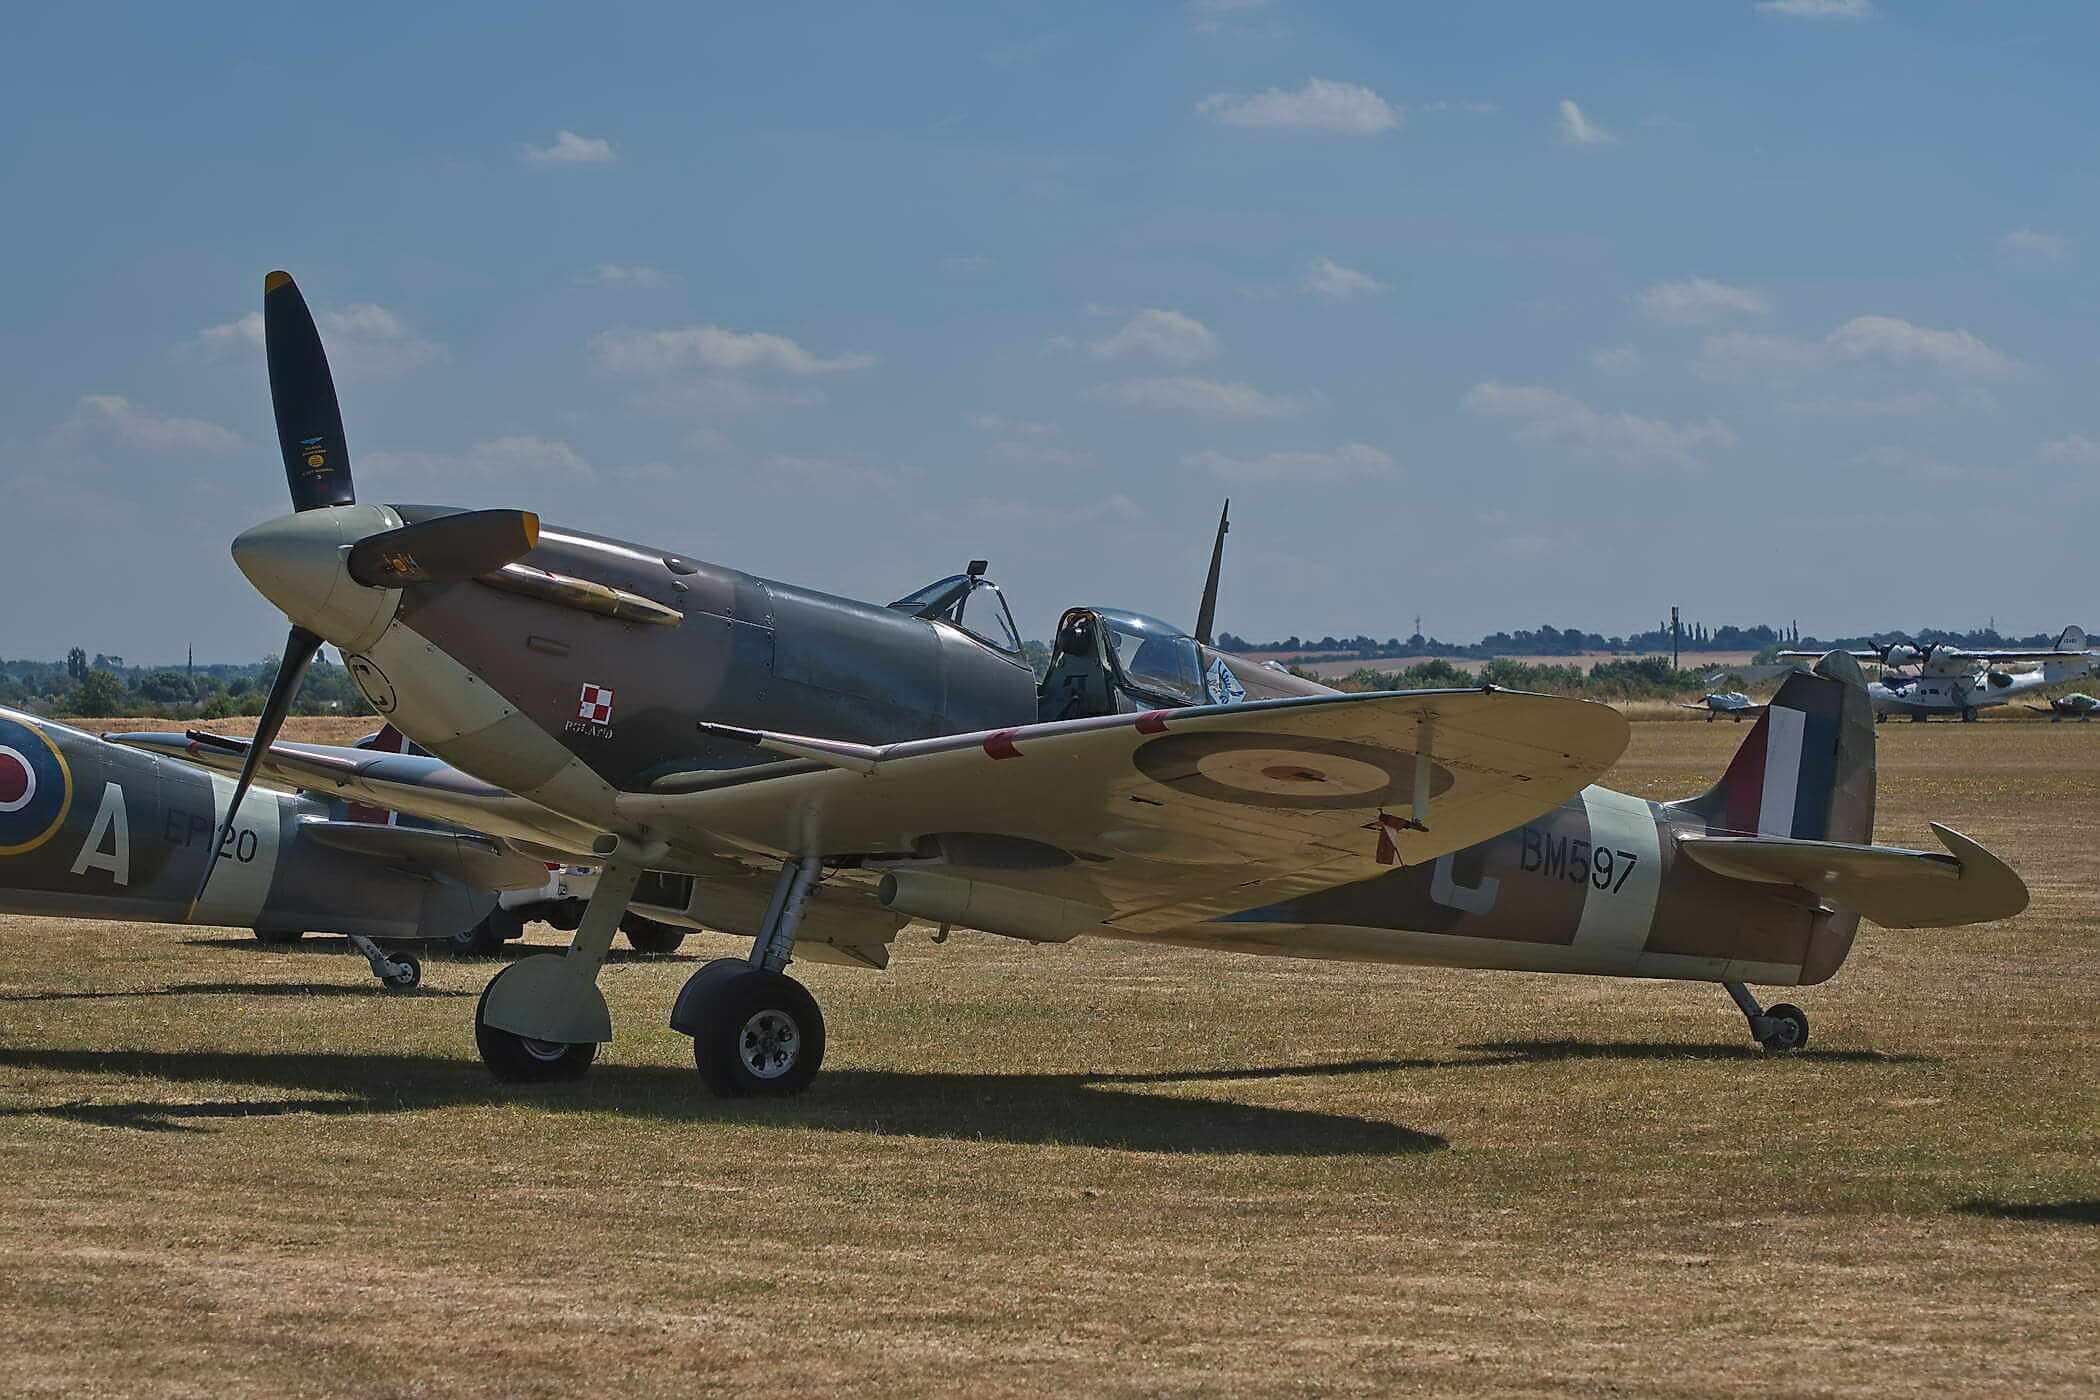 Spitfire F VB BM597